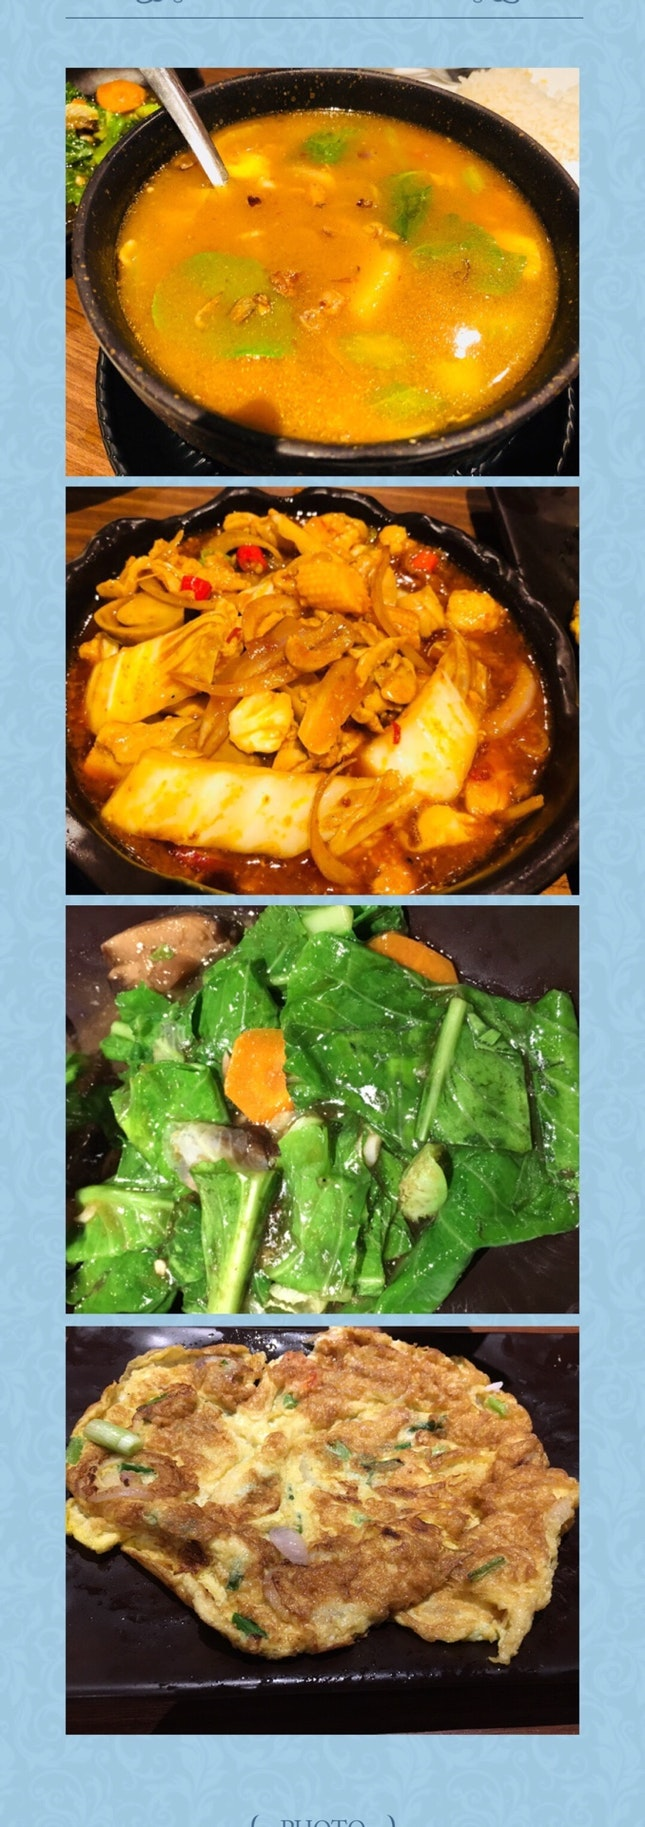 Asean Food Hunting